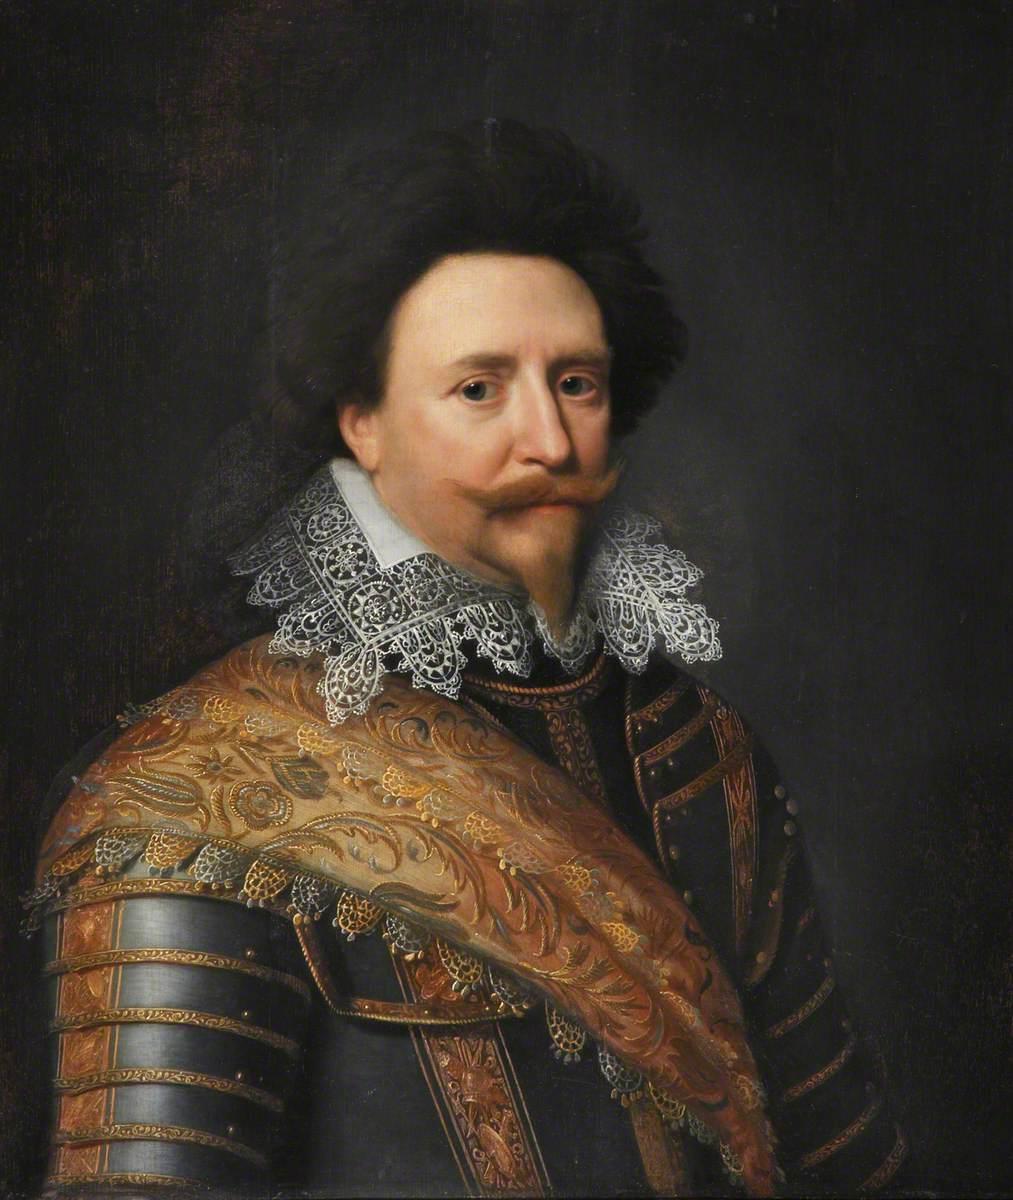 Prince Frederick Henry (1584–1647), Prince of Orange, Stadhouder of the United Provinces